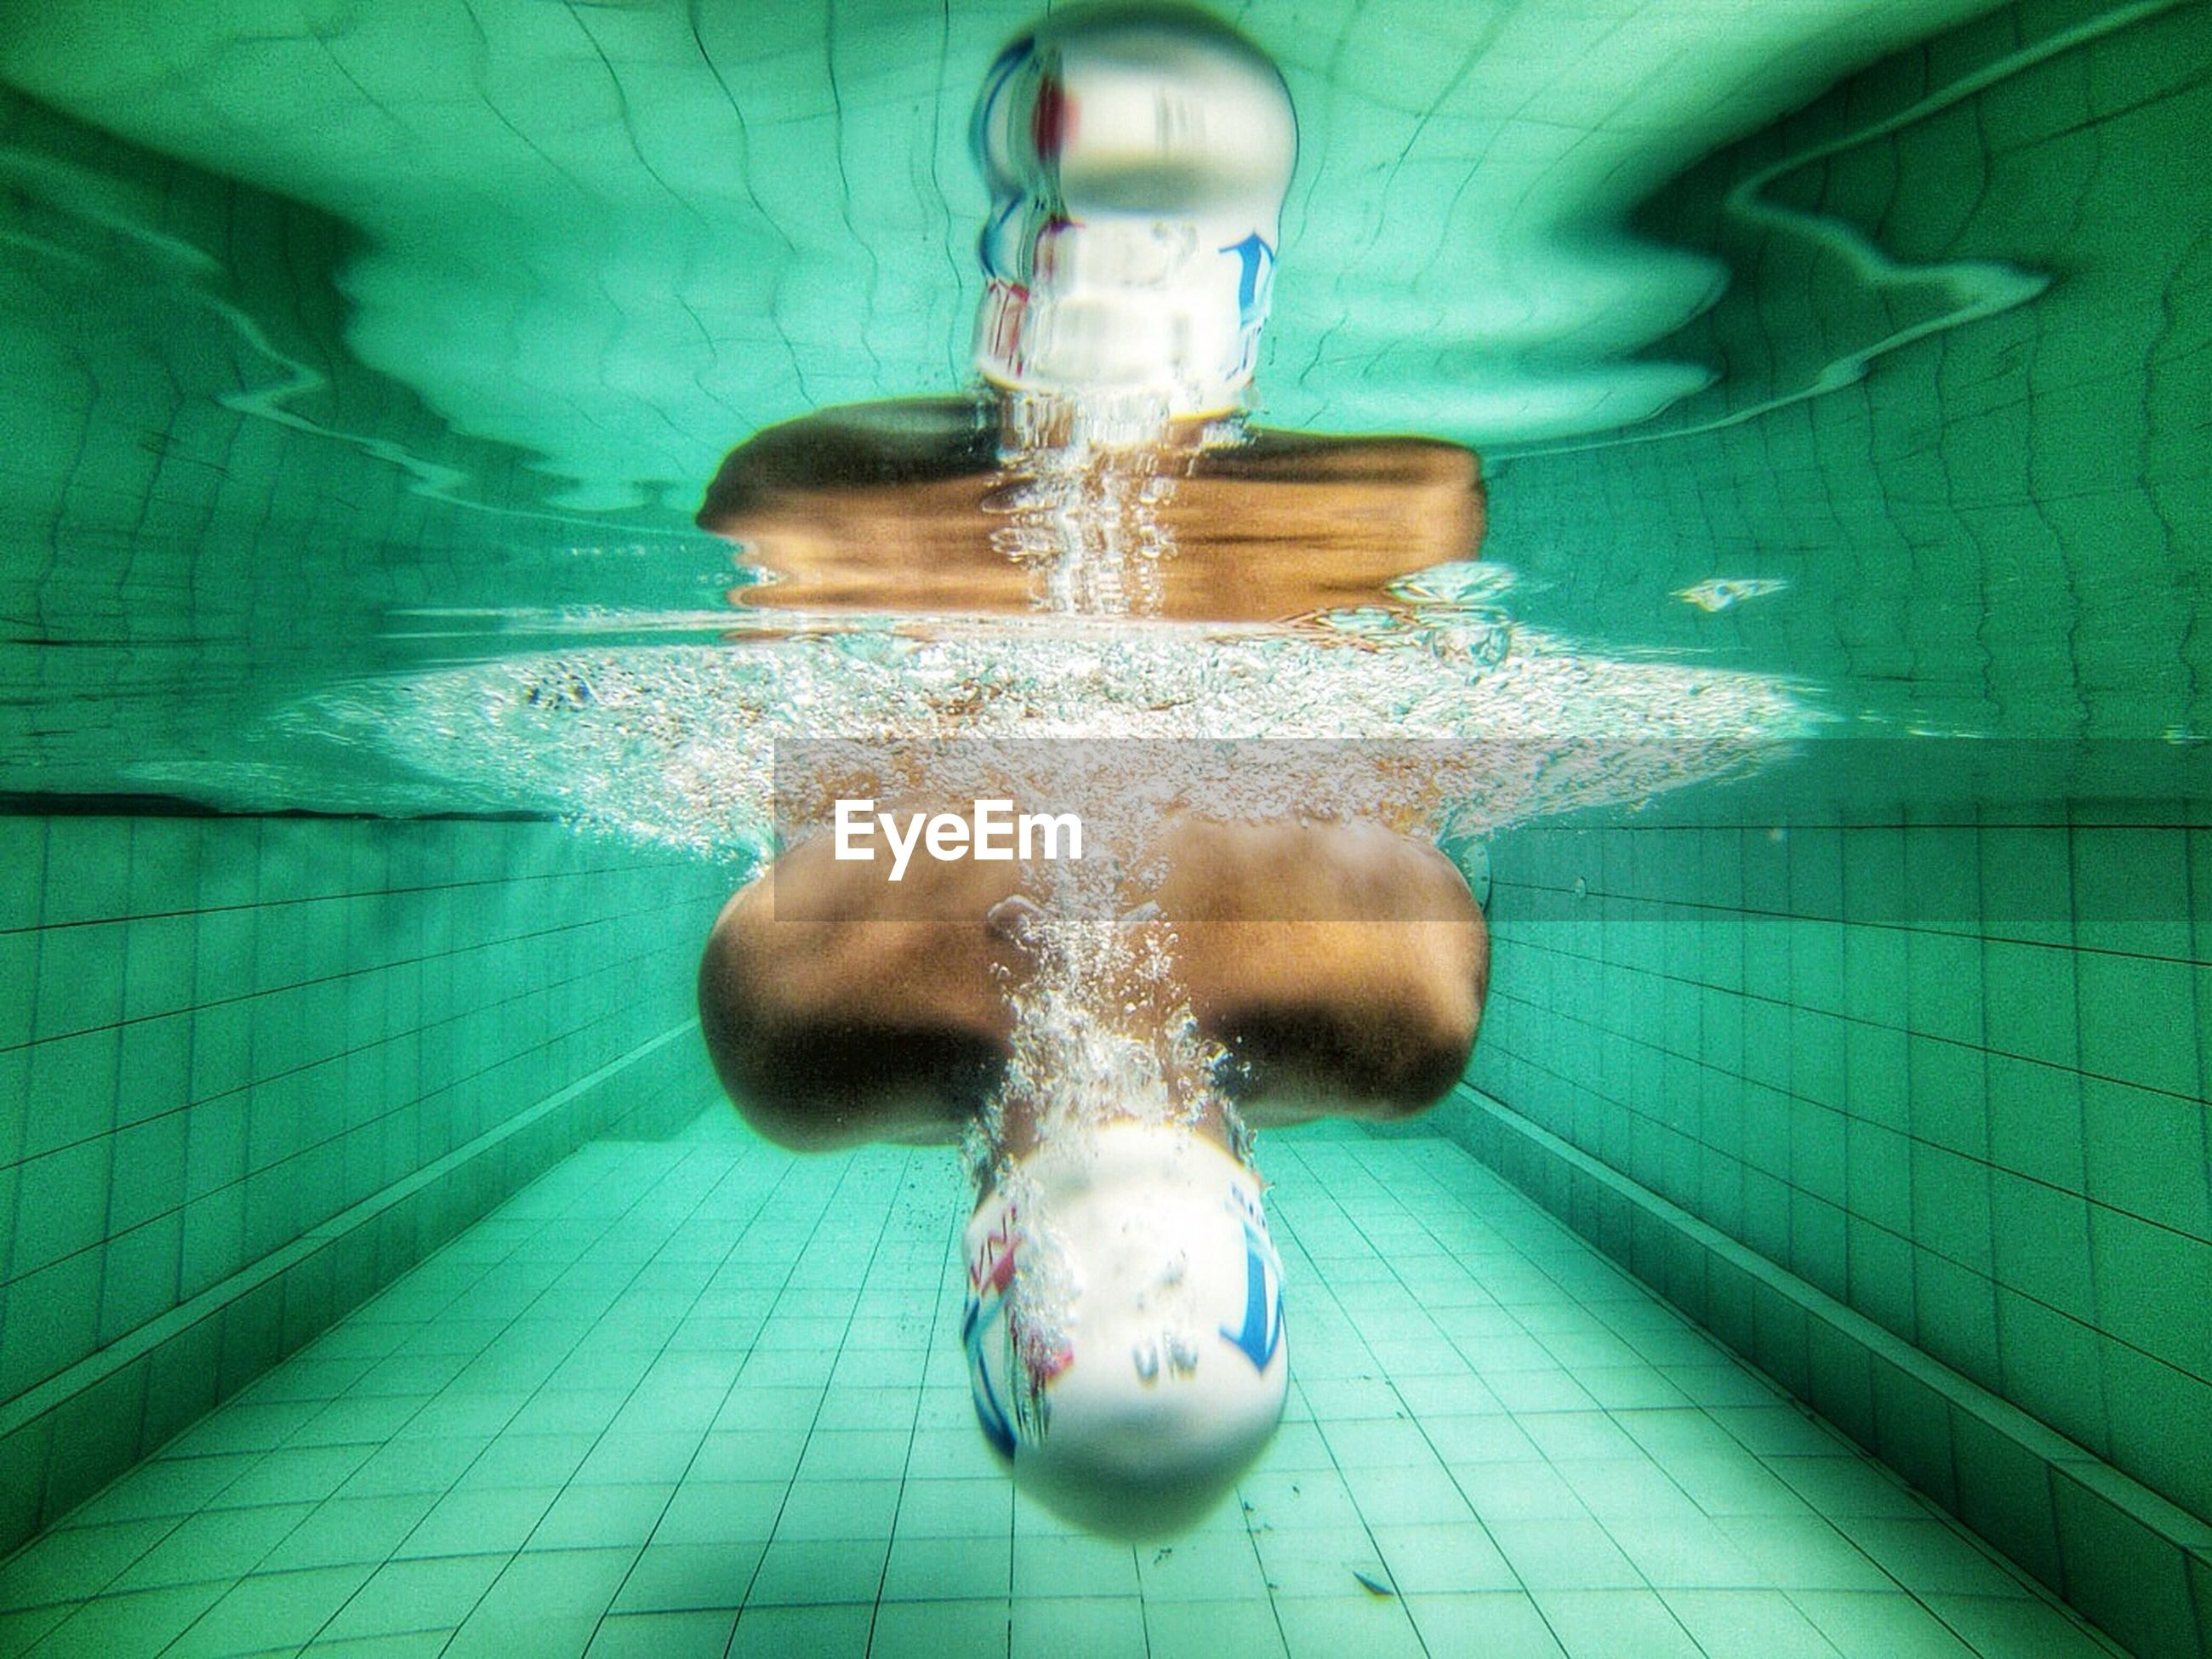 Man swimming in the pool